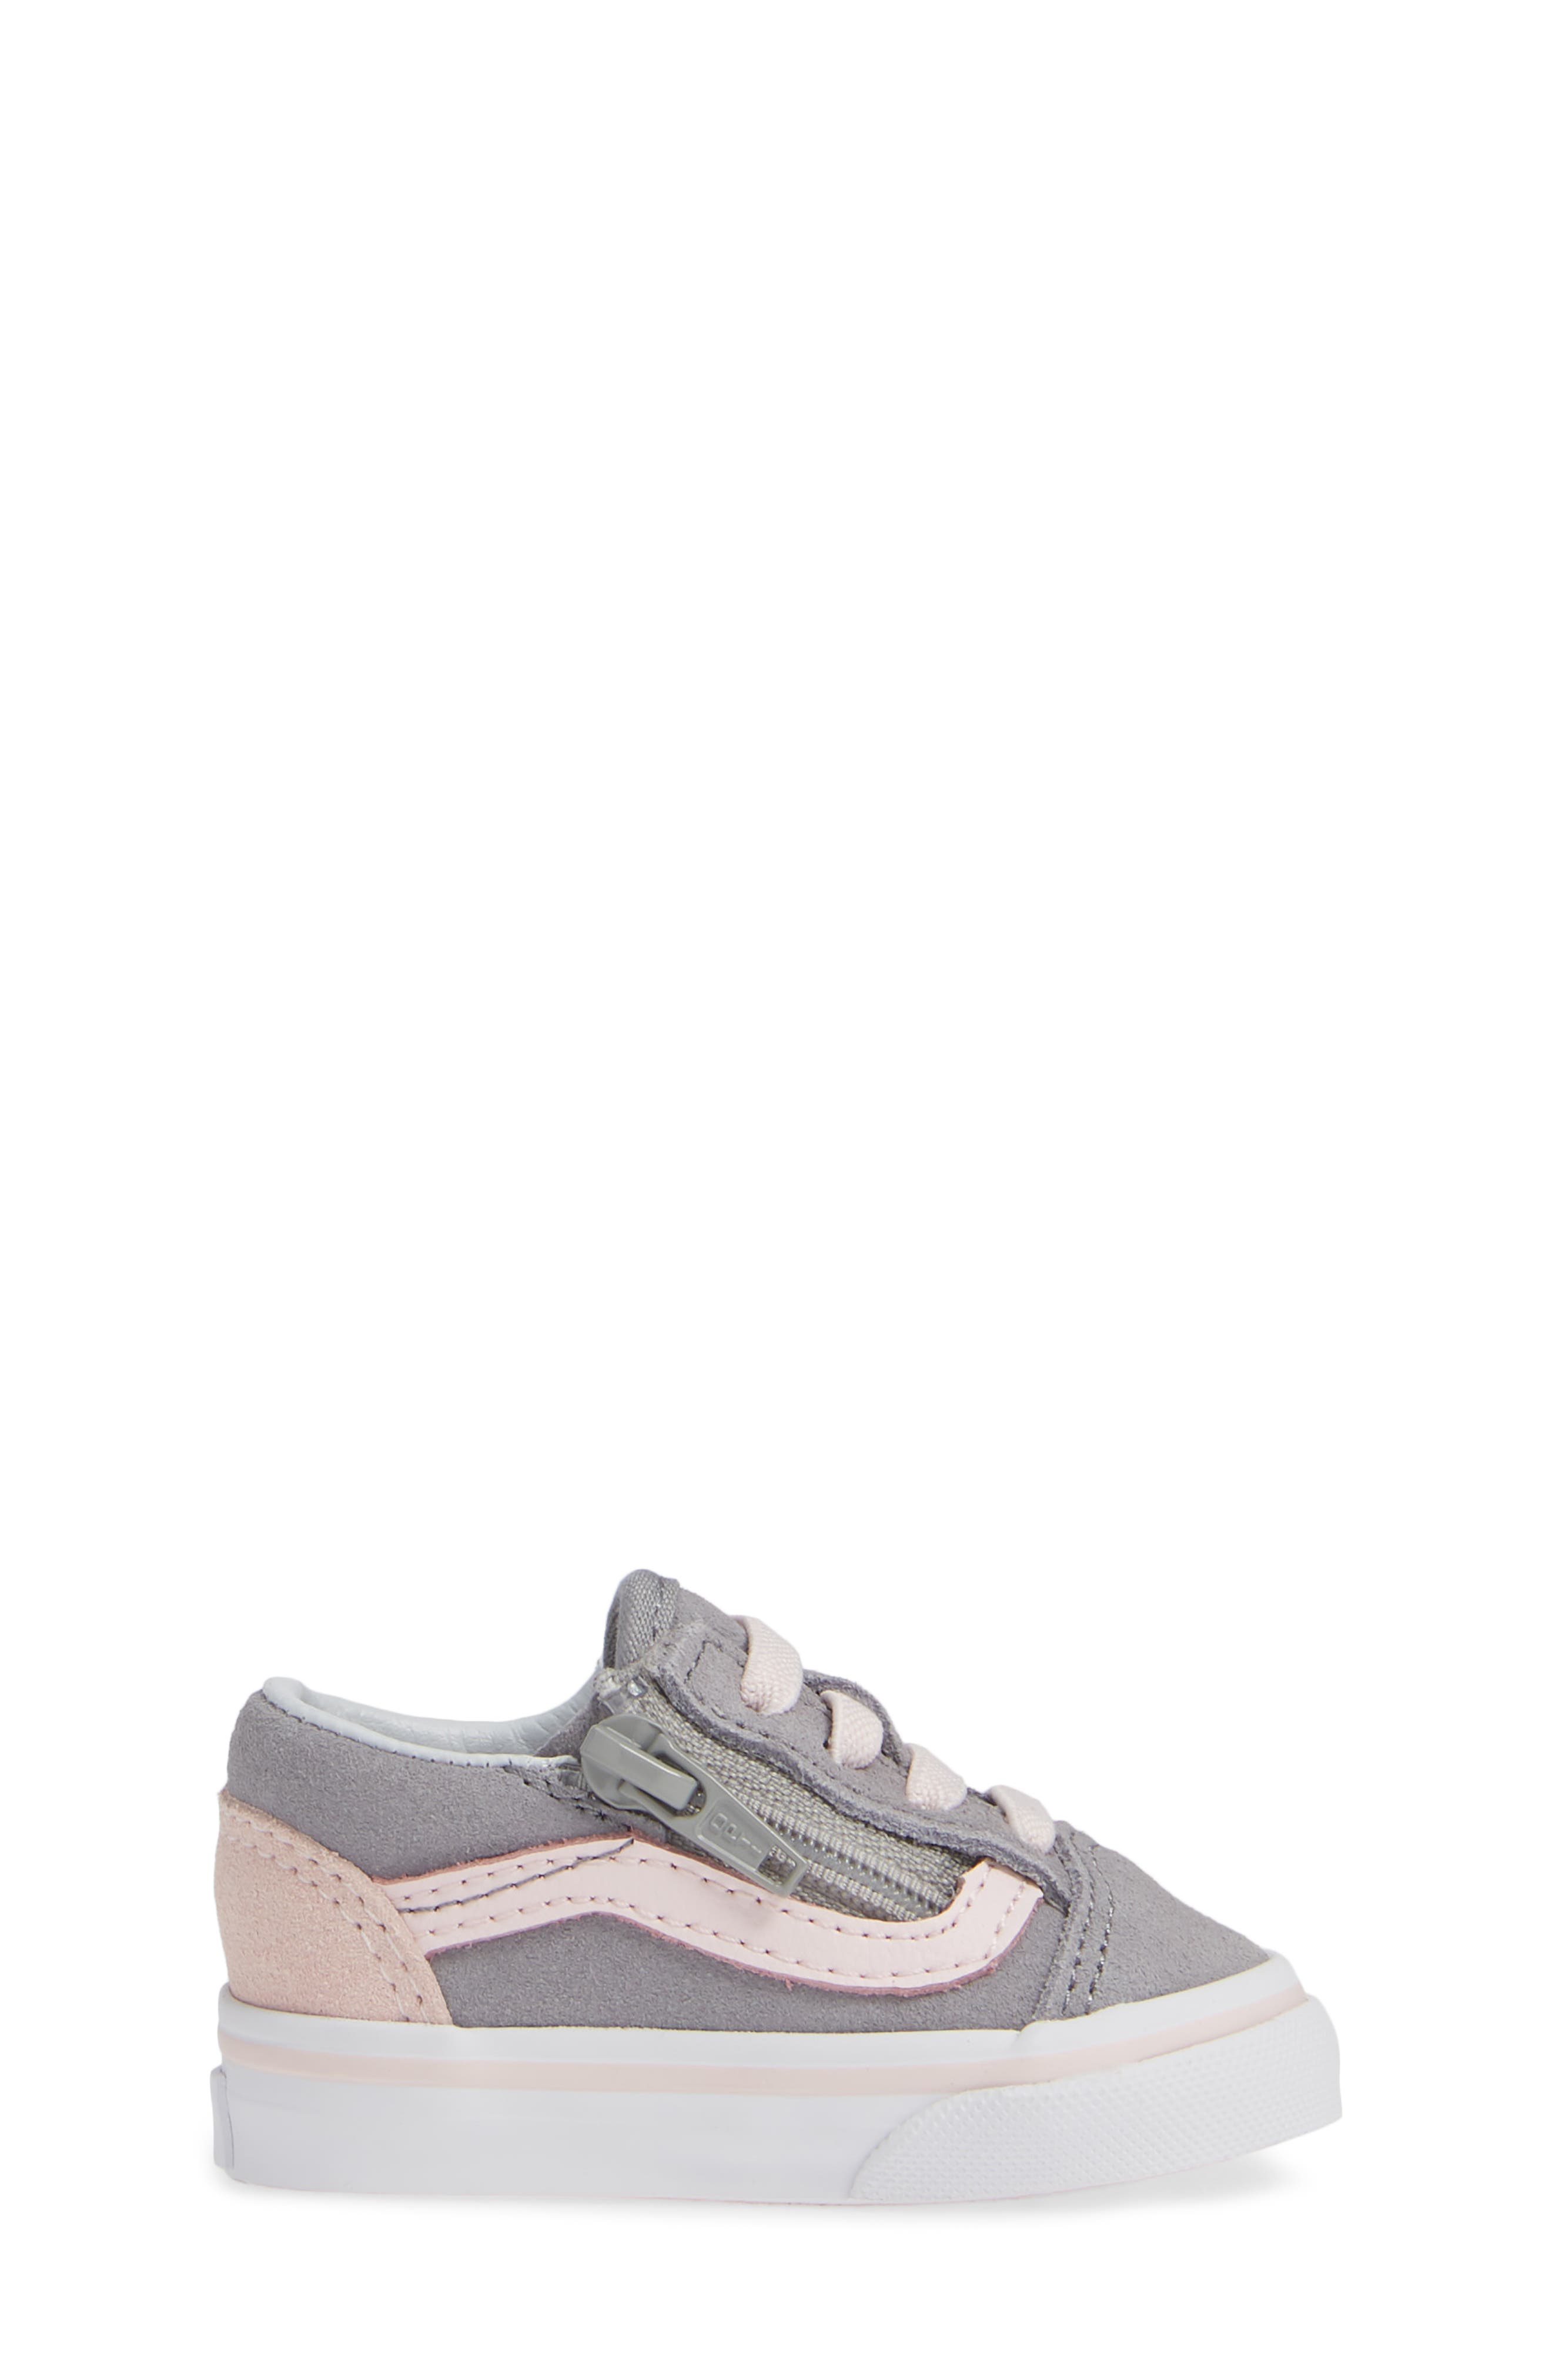 Old Skool Zip Sneaker,                             Alternate thumbnail 3, color,                             SUEDE ALLOY/ PINK/ TRUE WHITE